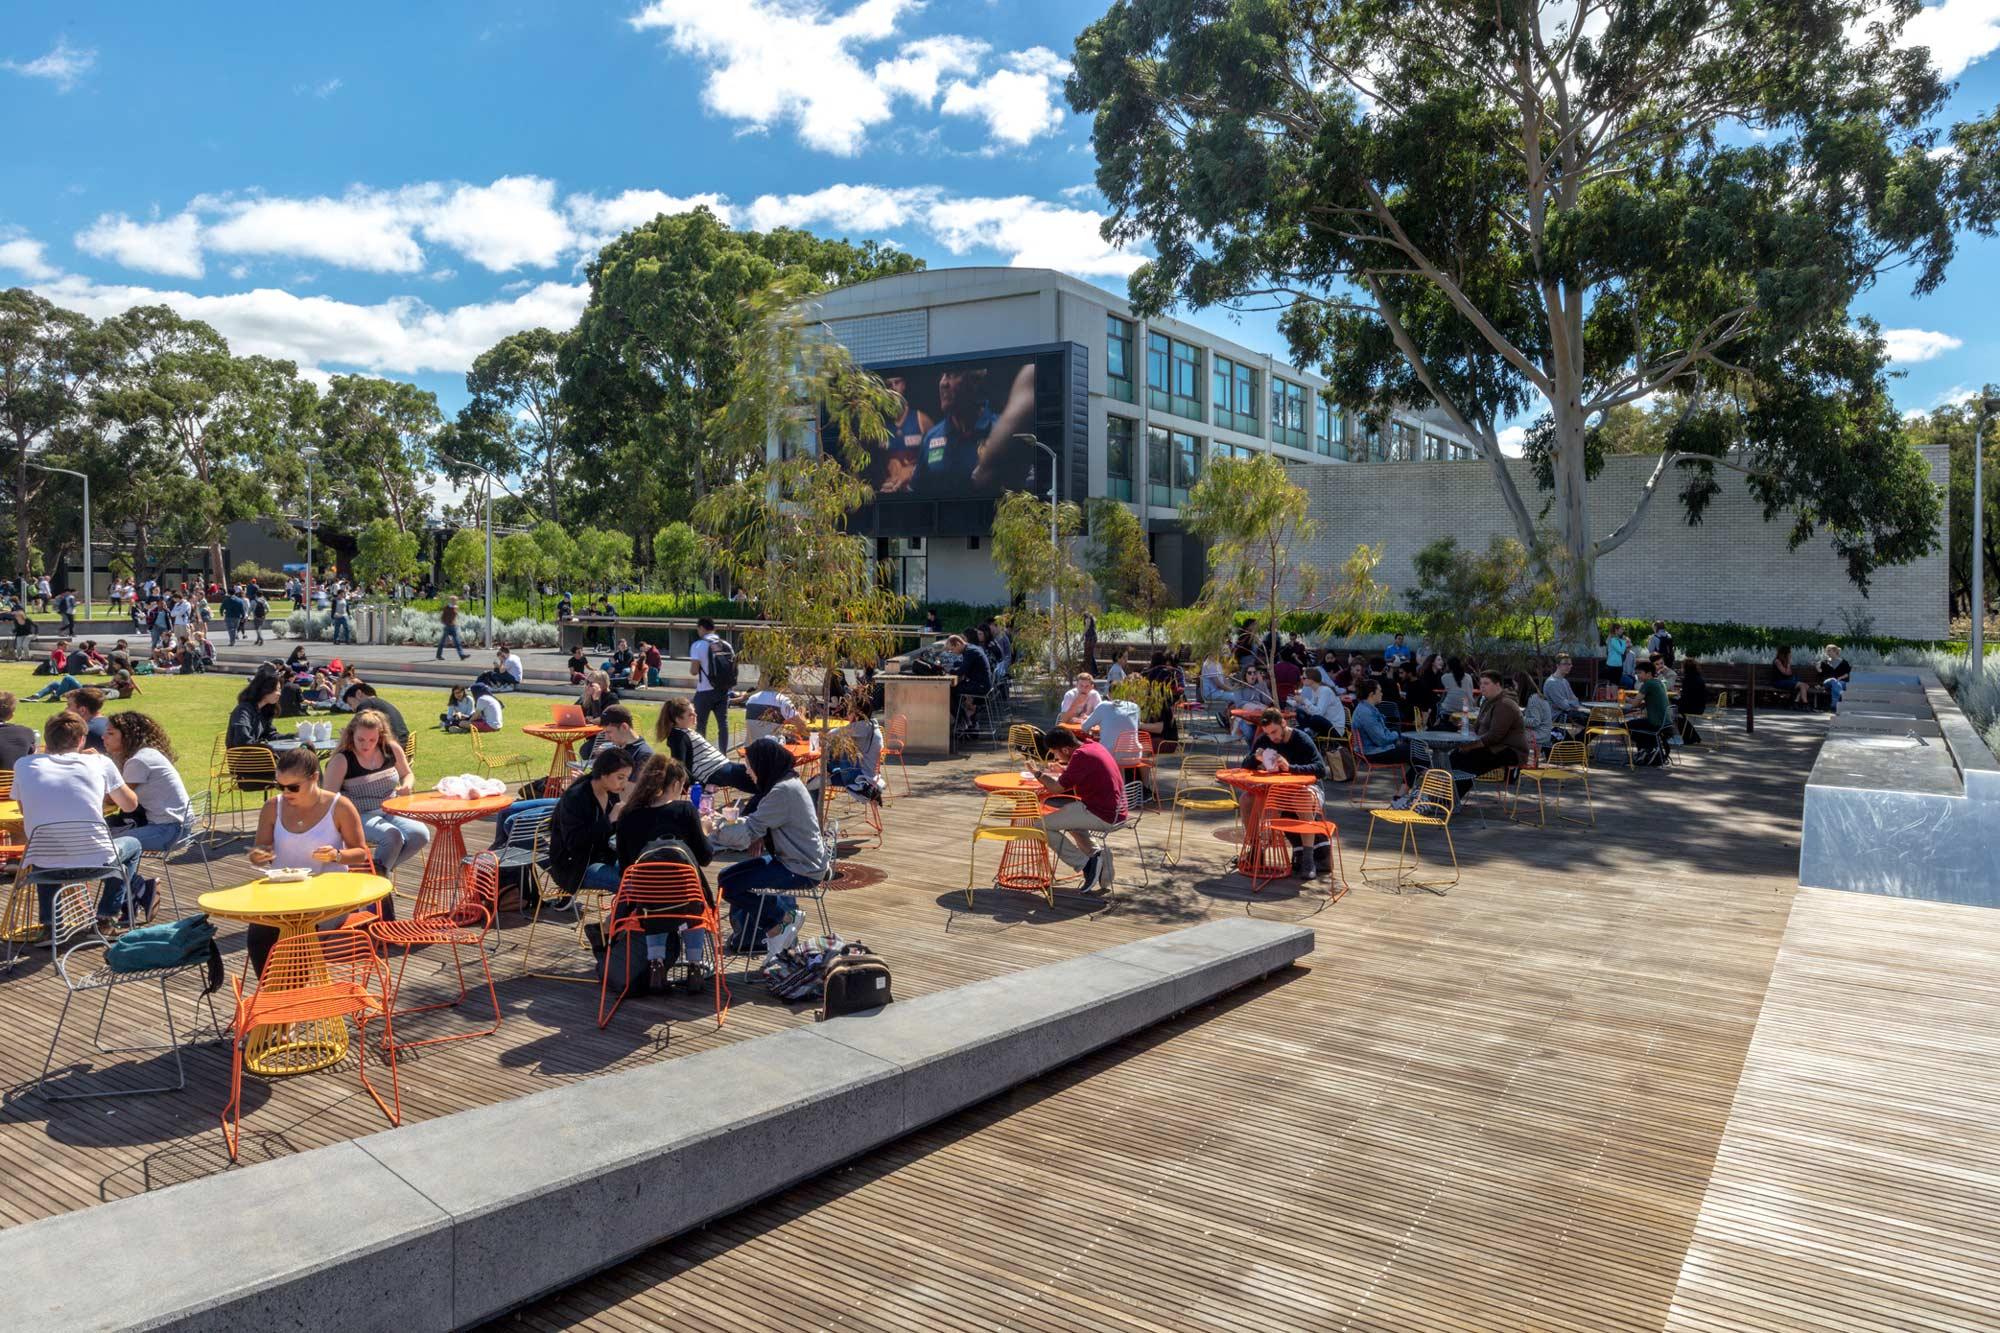 Tcl monash northern plaza ben wrigley 03 rgb 72dpi landscape architecture works landezine - Social life in small urban spaces model ...